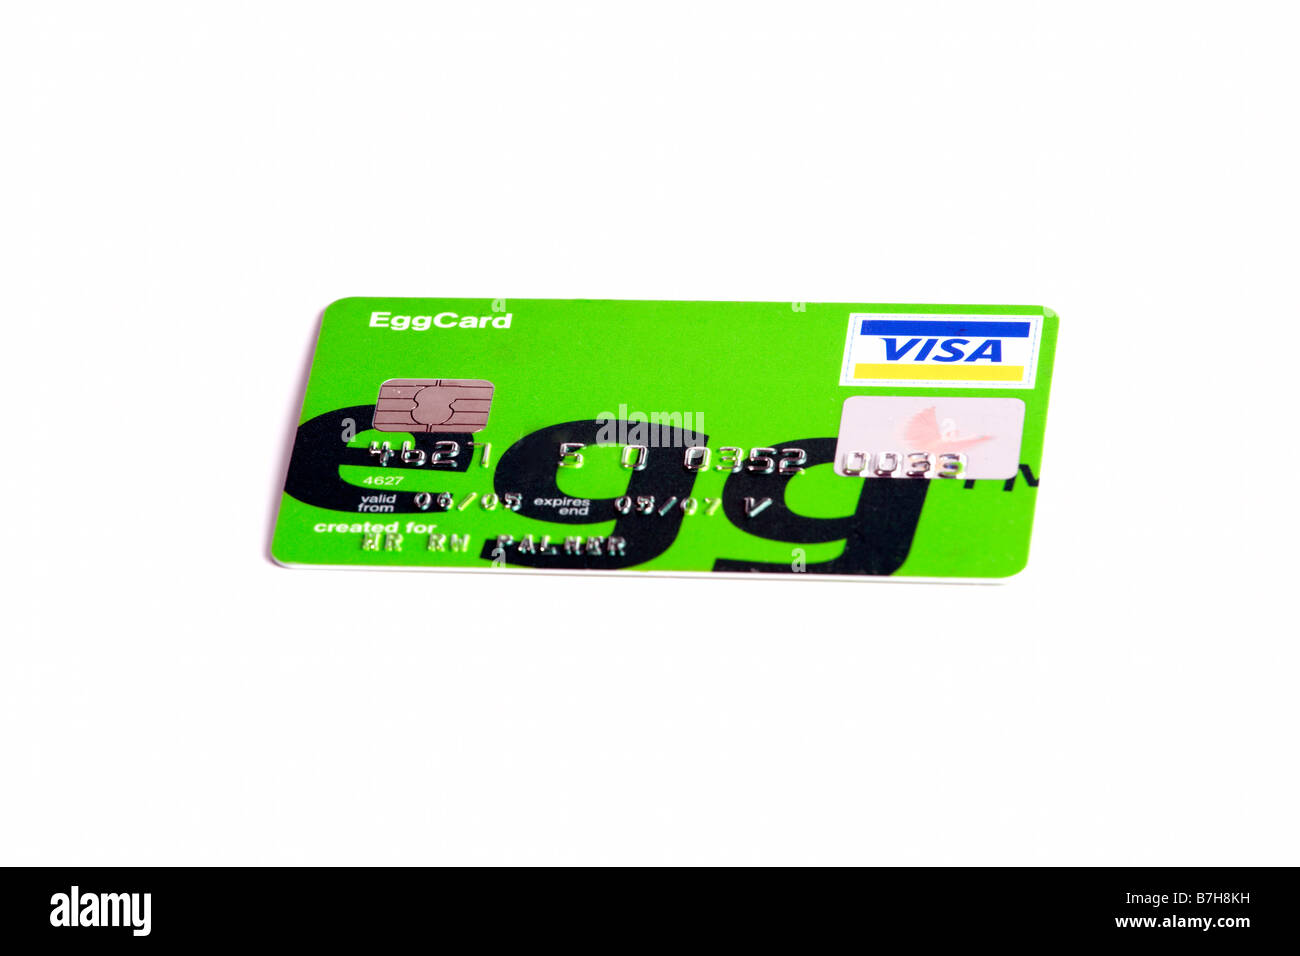 Egg Credit card Stock Photo